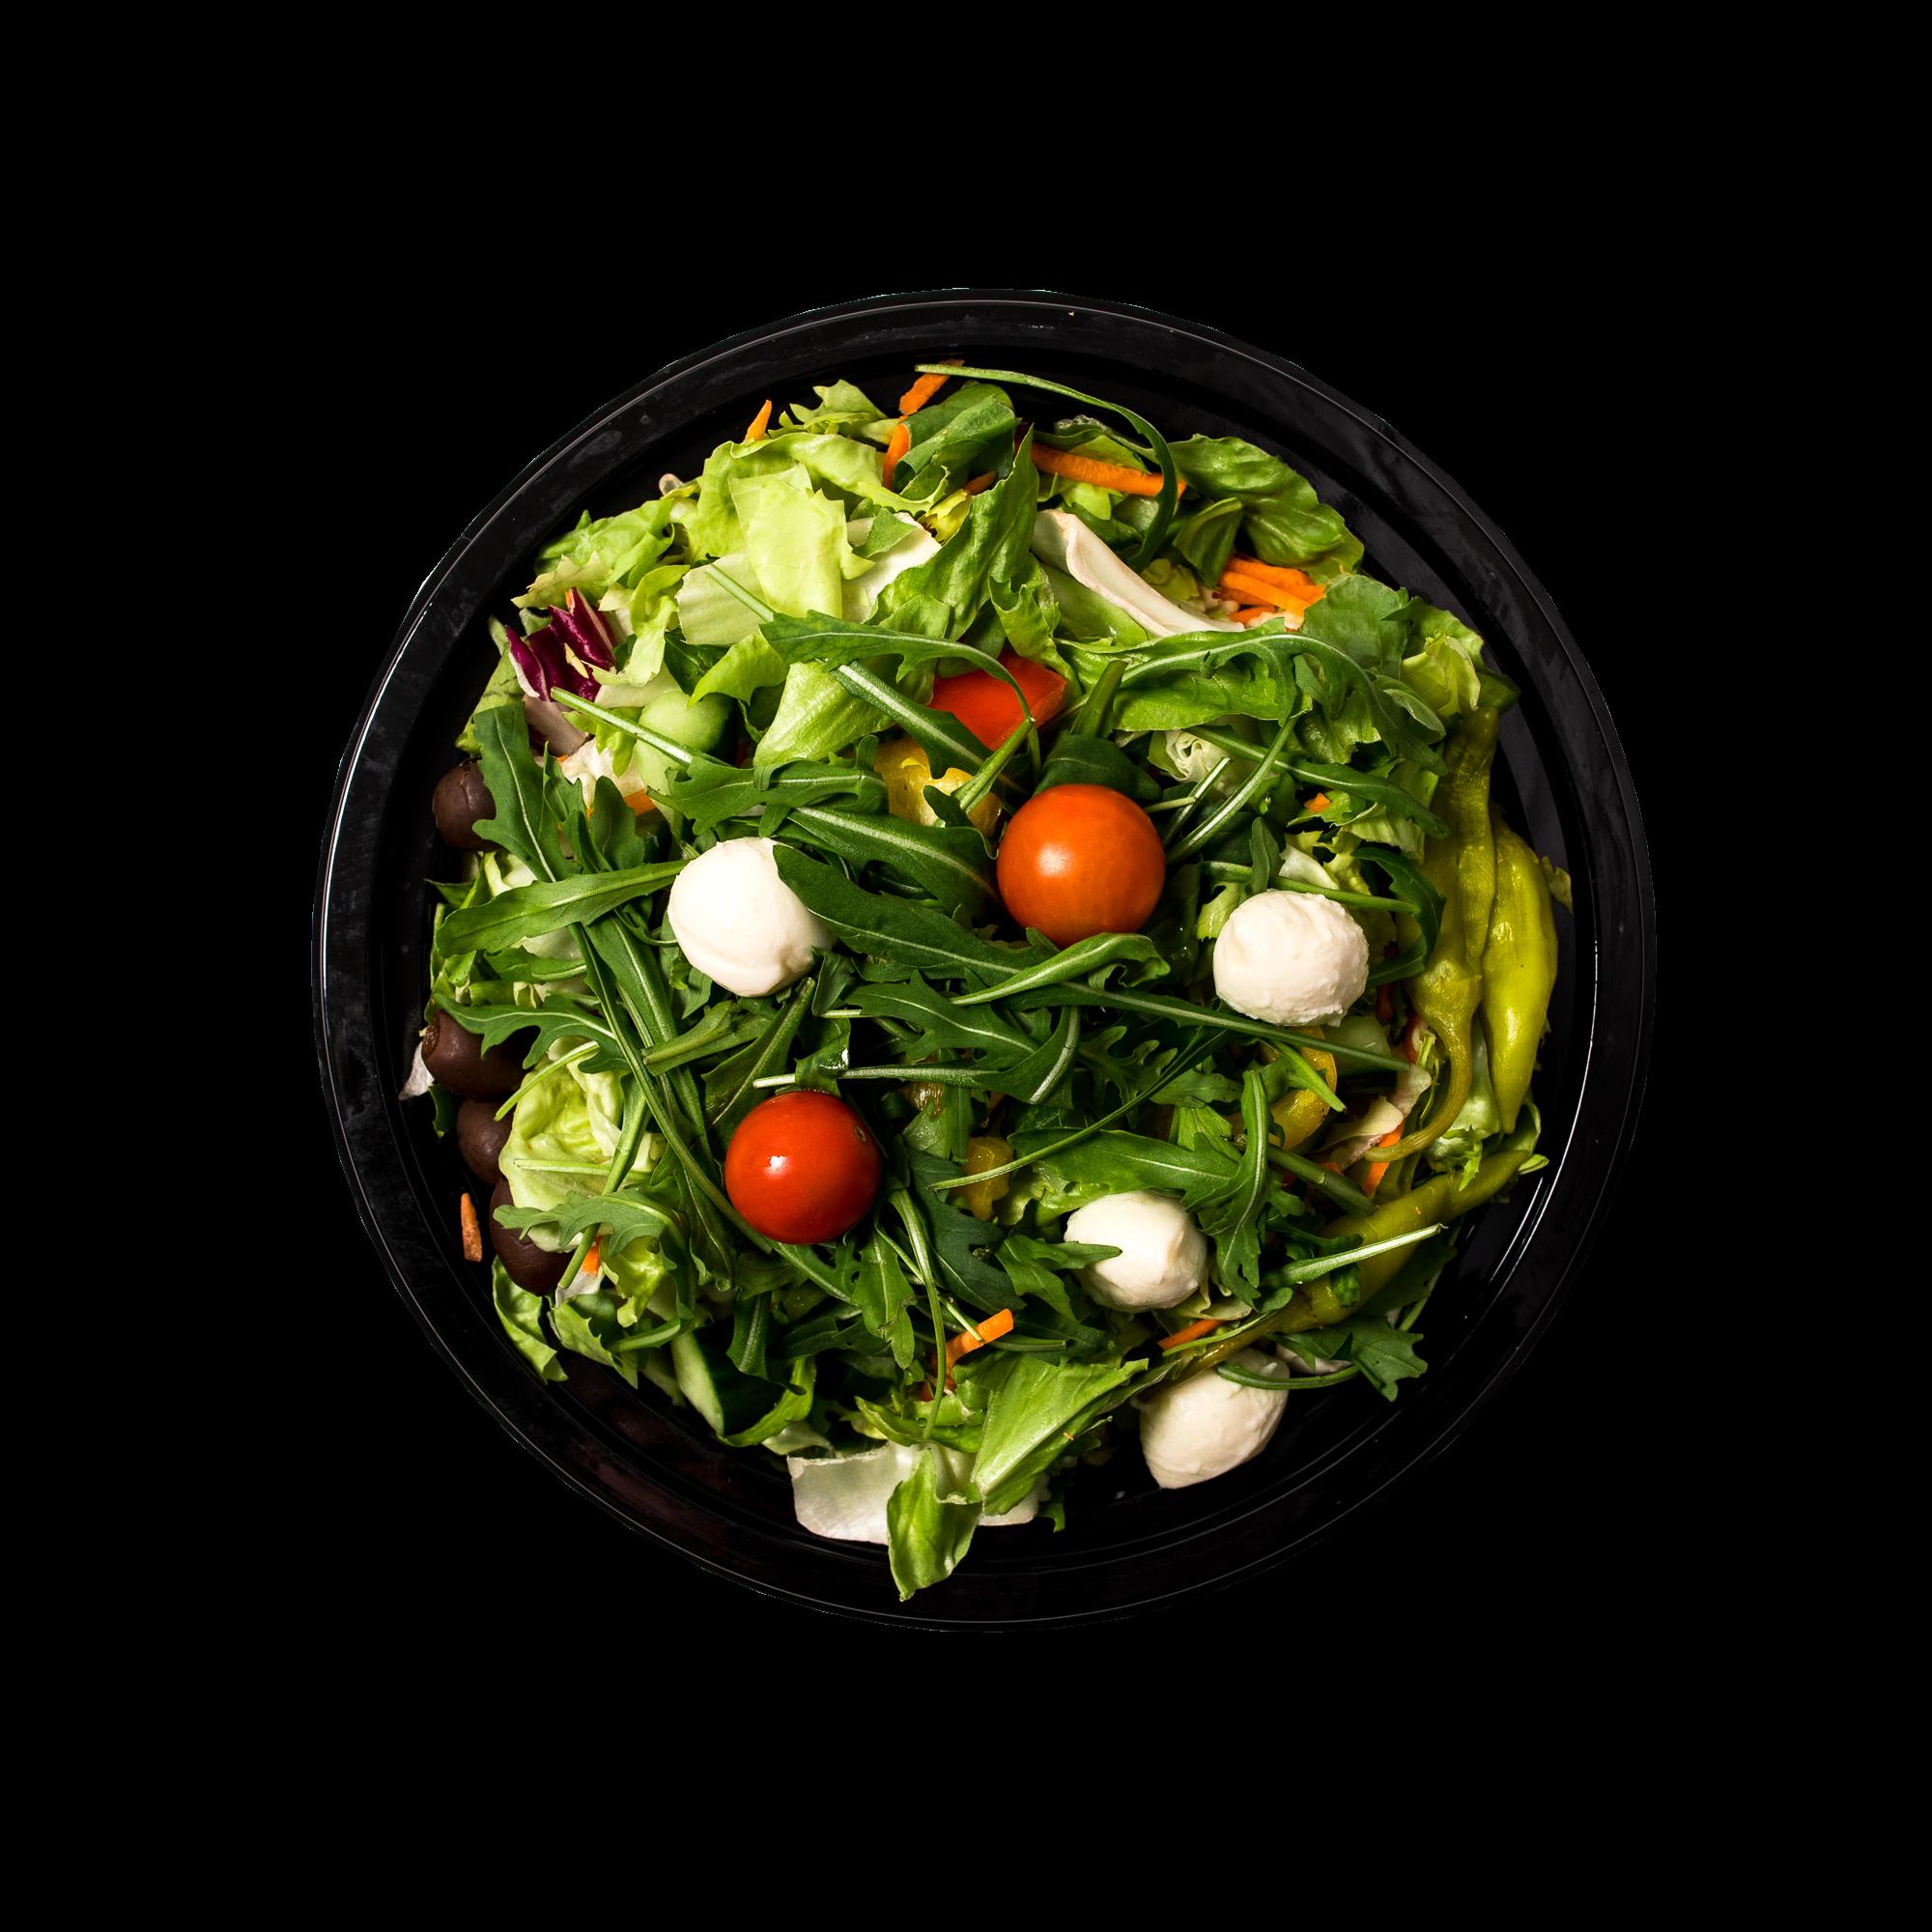 000000_King-Size-Salat-Italia-_top_quadratisch